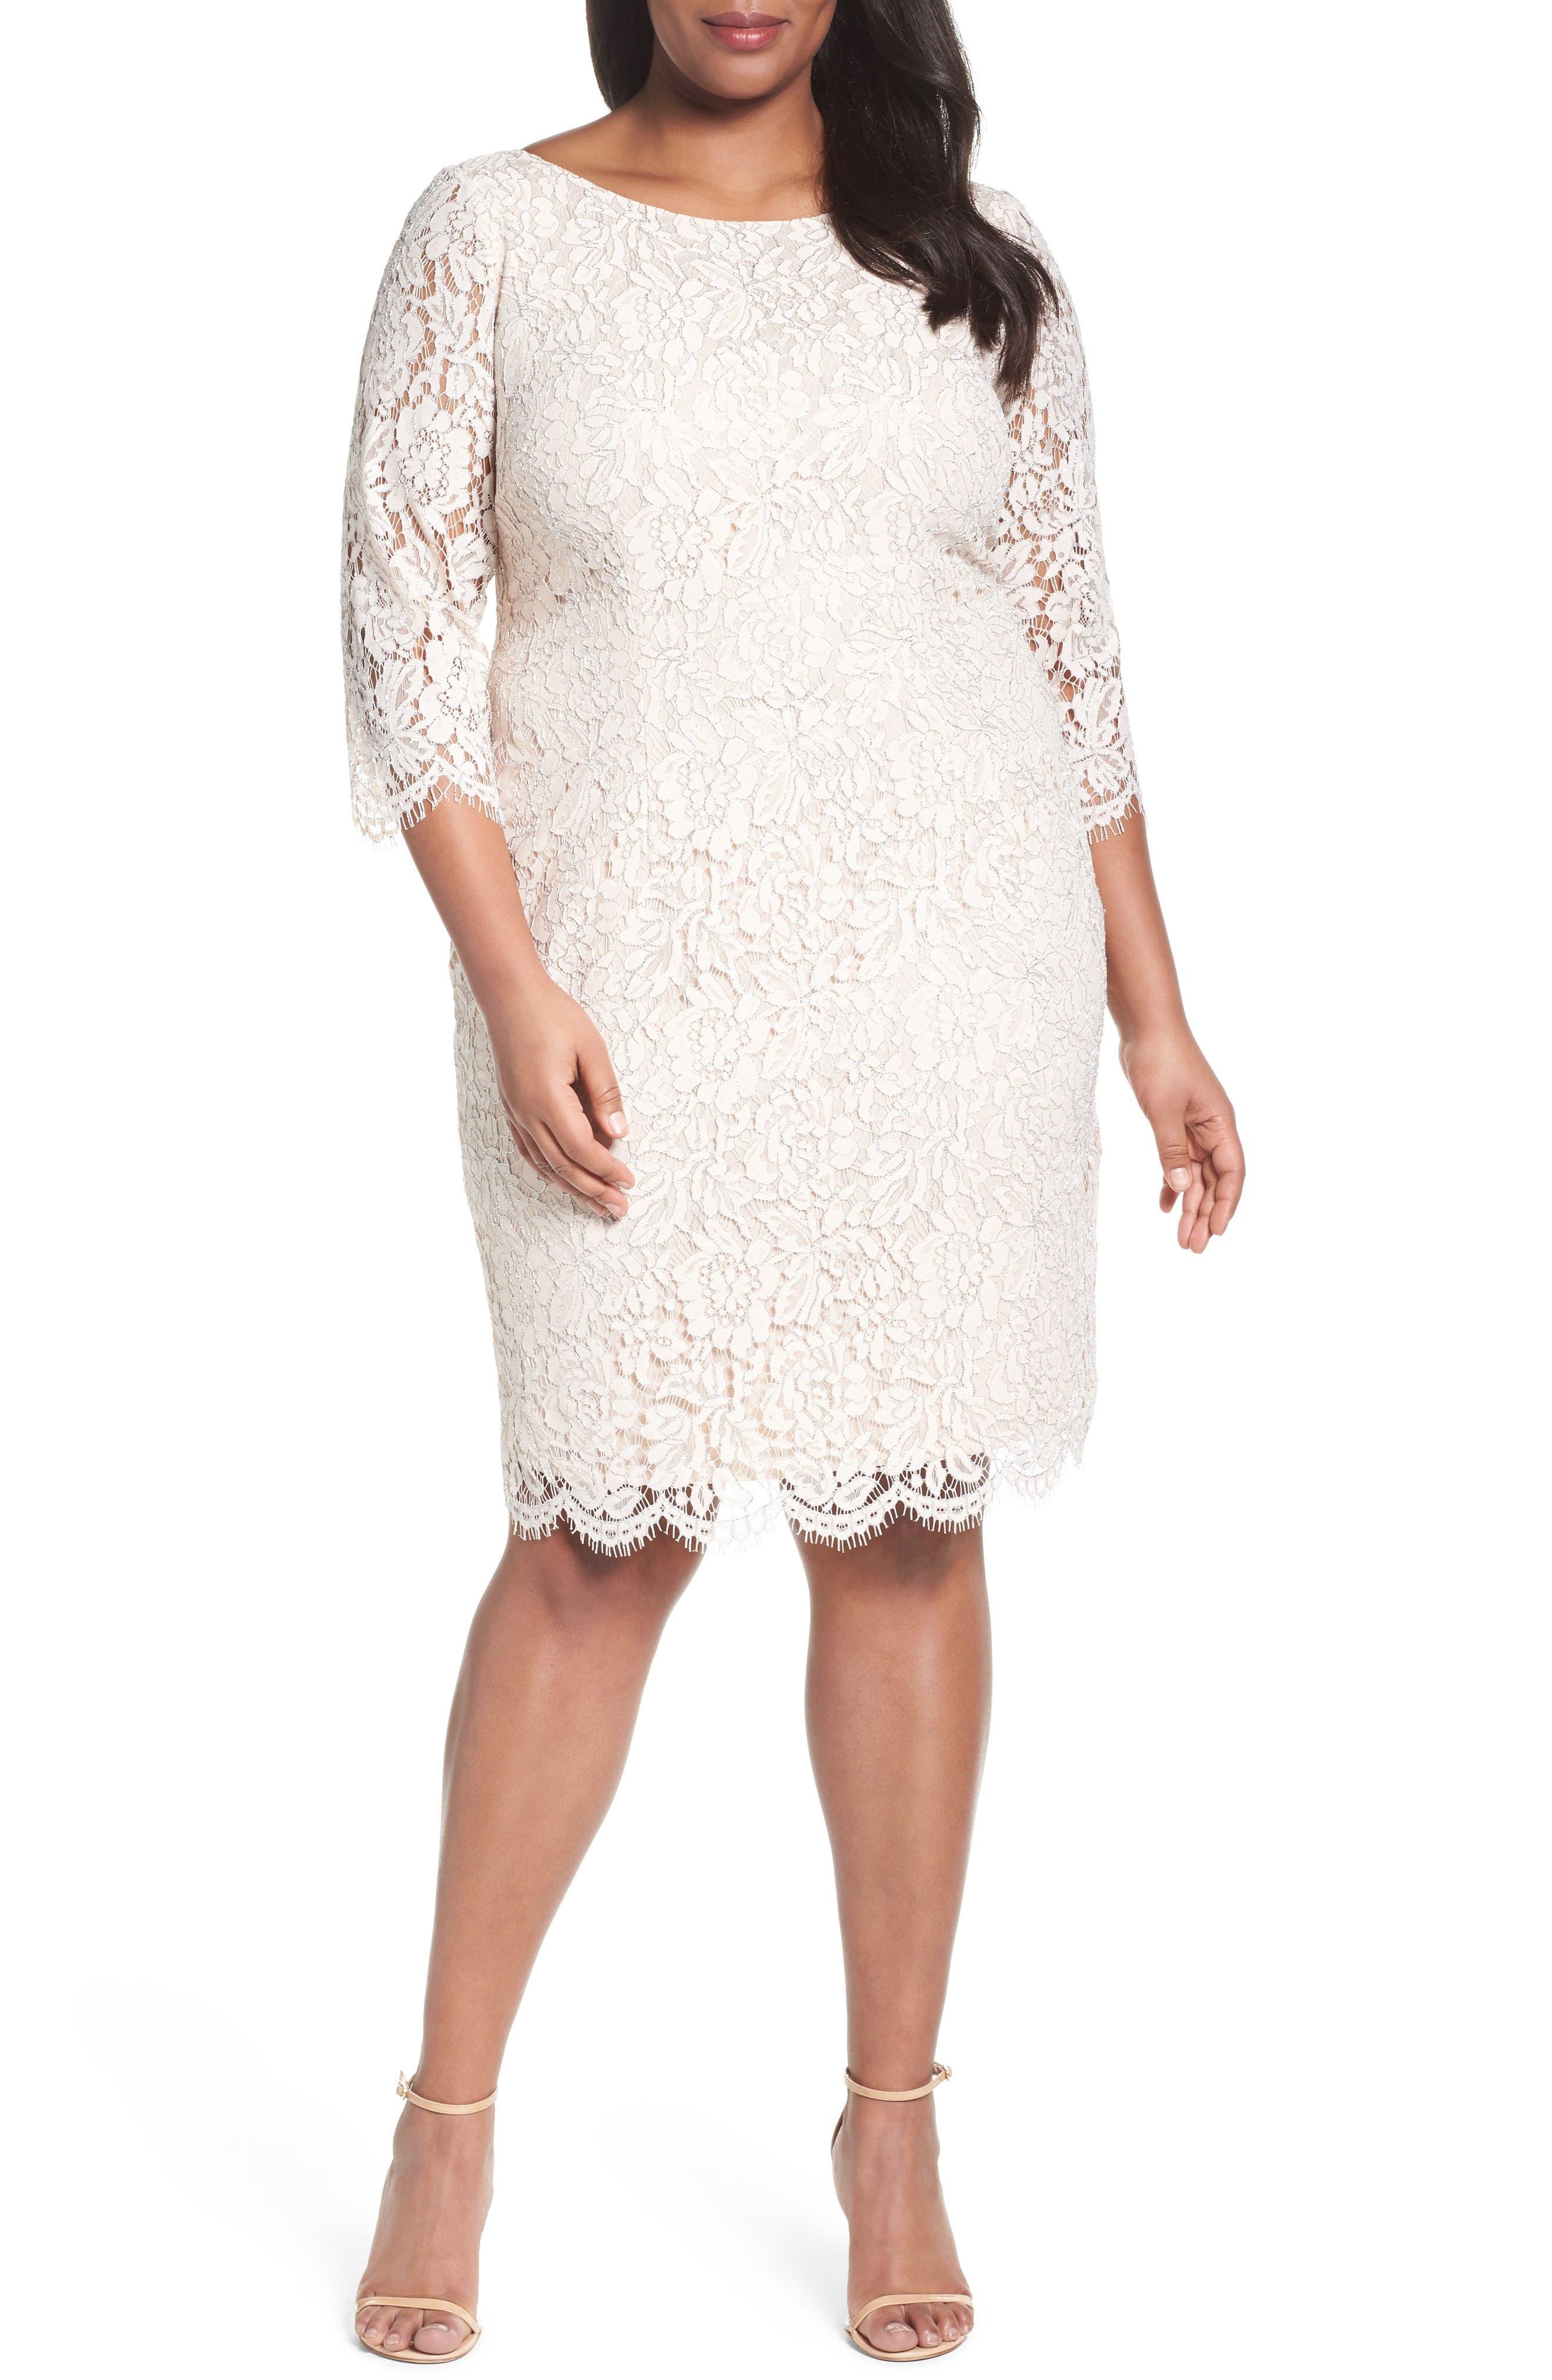 Adrianna Papell Metallic Lace Sheath Dress (Plus Size)